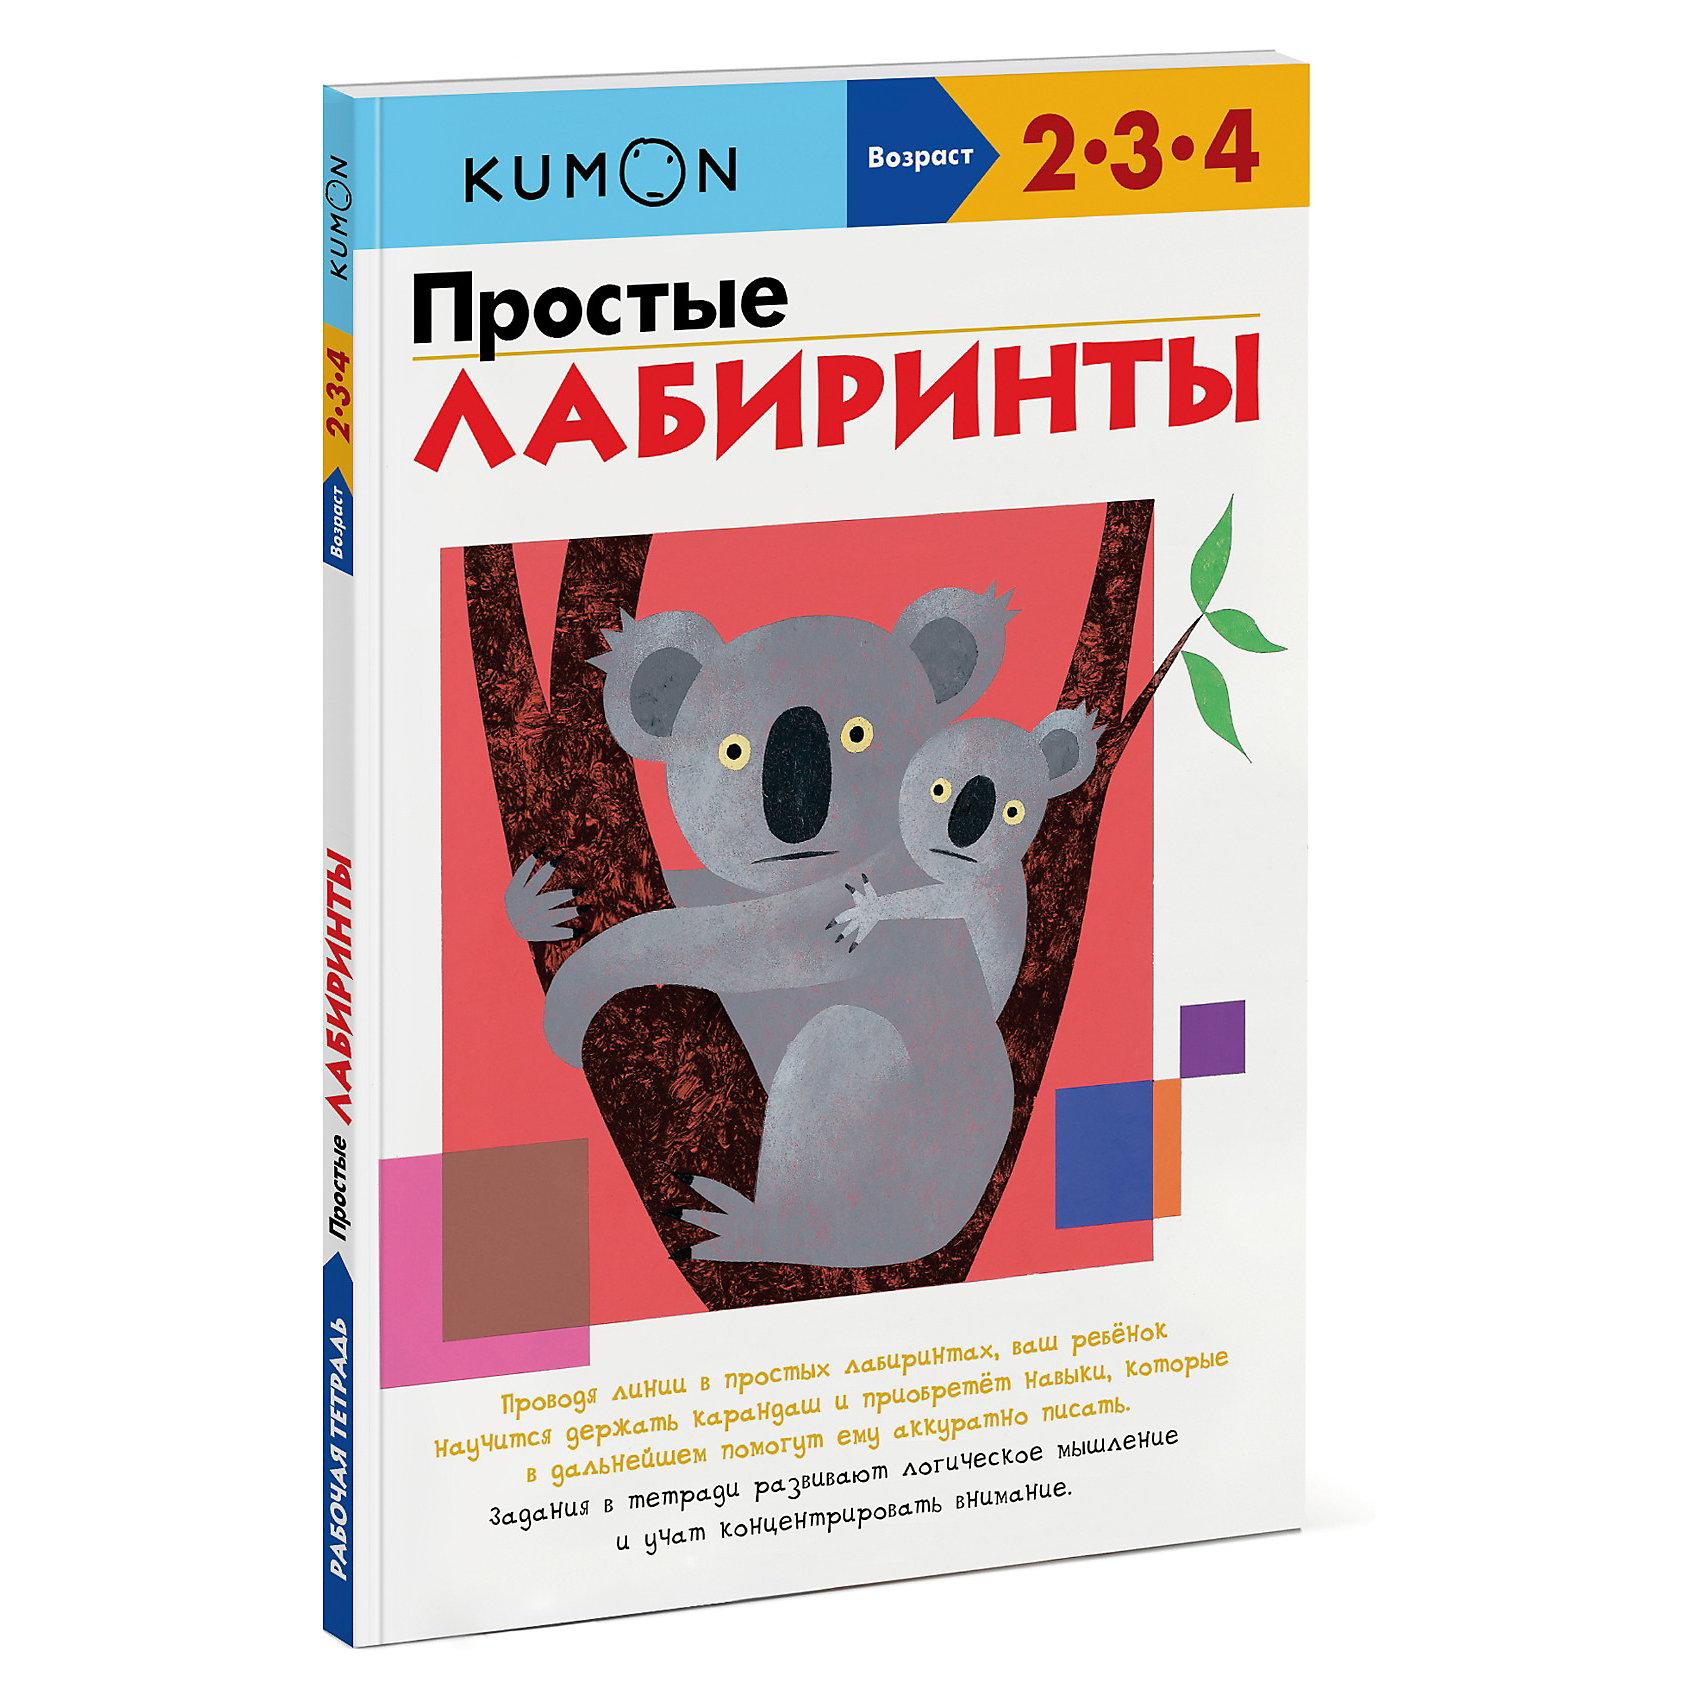 Манн, Иванов и Фербер Простые лабиринты KUMON, Манн, Иванов и Фербер